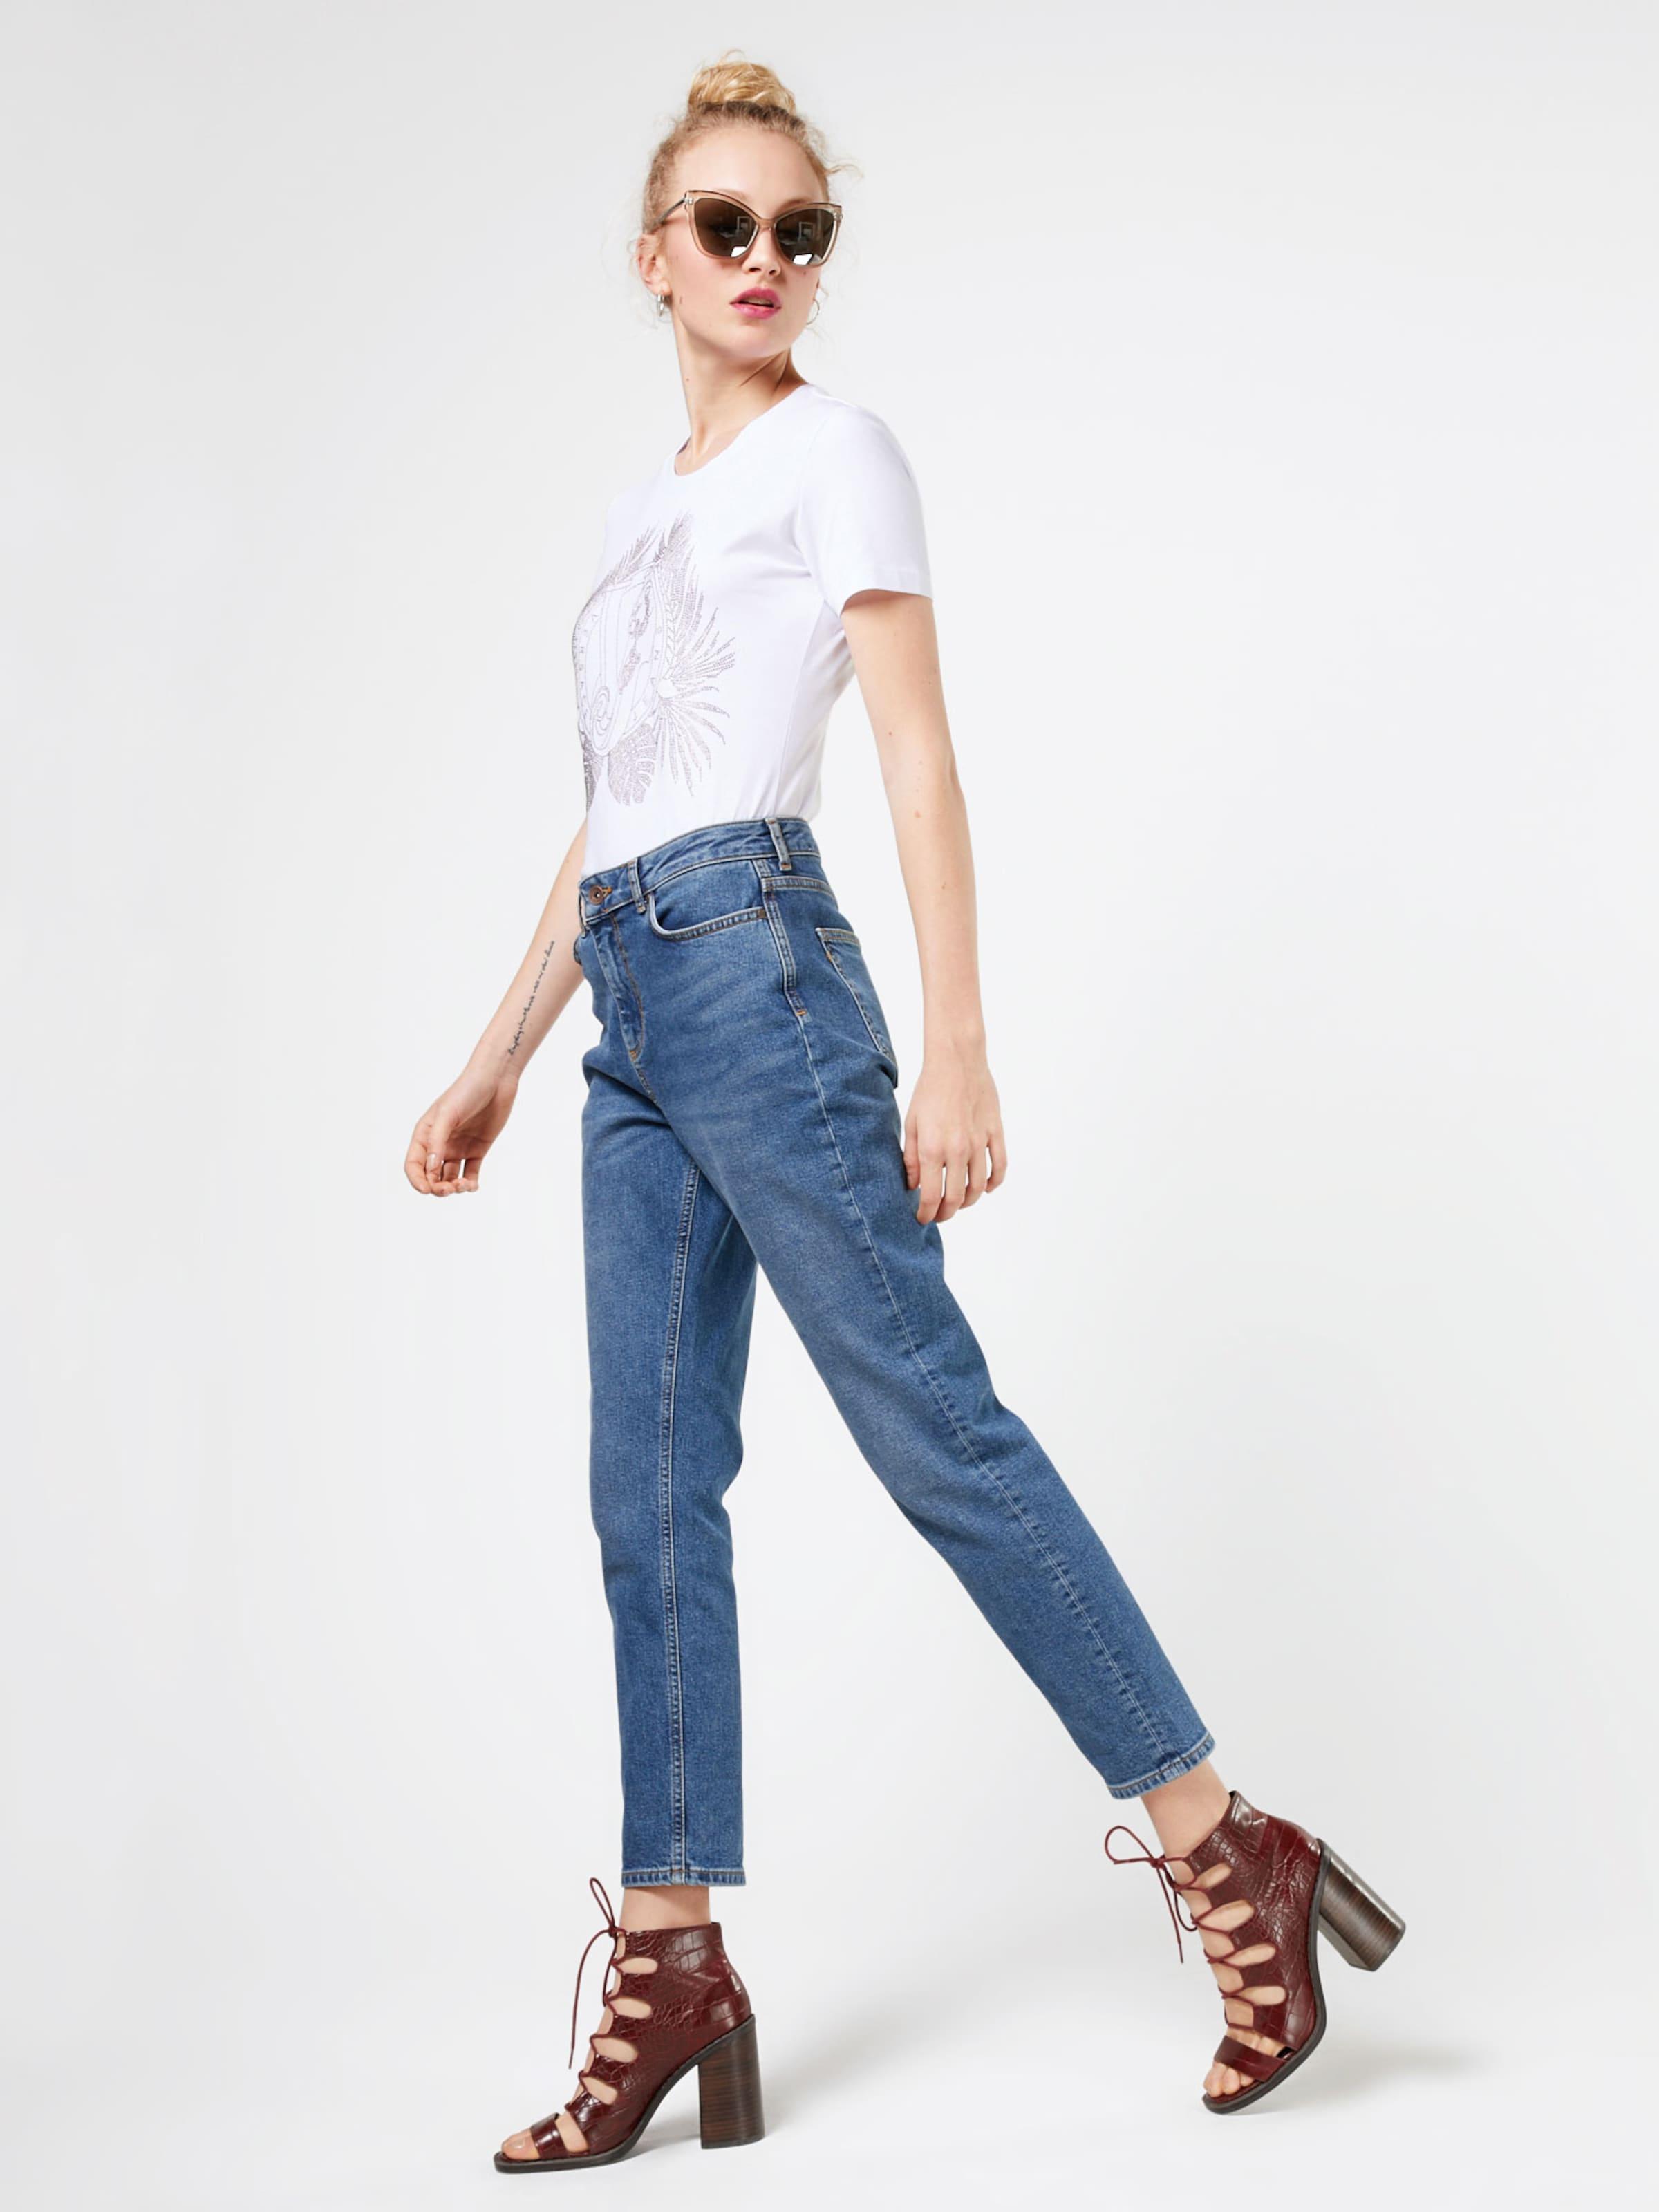 Versace Jeans T-Shirt 'RDM606 42' 2018 Neu Zu Verkaufen Spielraum Besten Klassische Online-Verkauf Ausgang Finden Große Auslass Großhandelspreis J6e8Sw